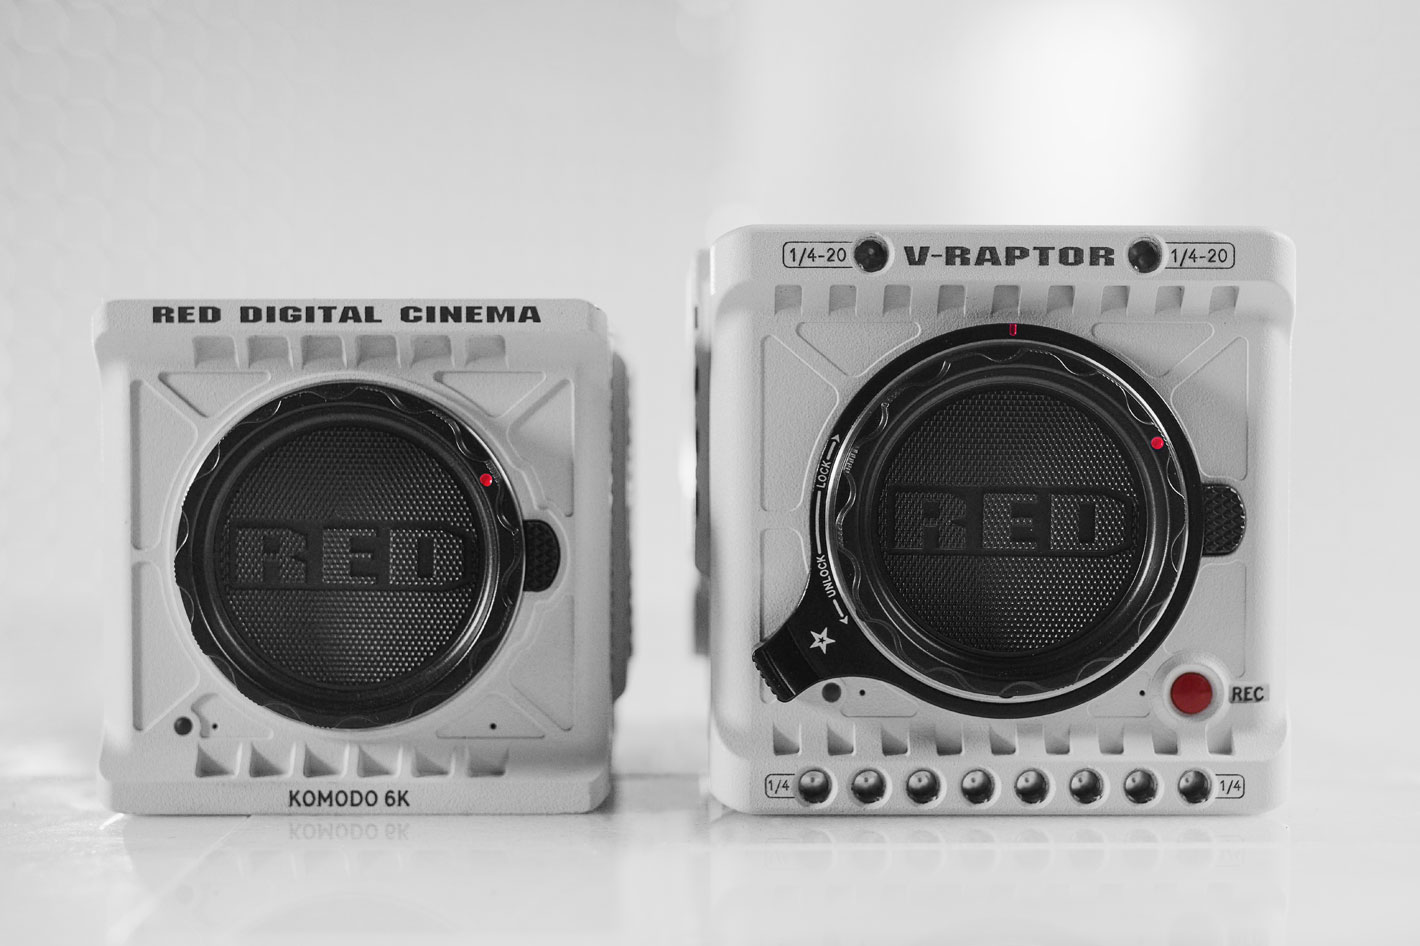 RED Digital Cinema launches V-RAPTOR 8K VV, a next-generation camera